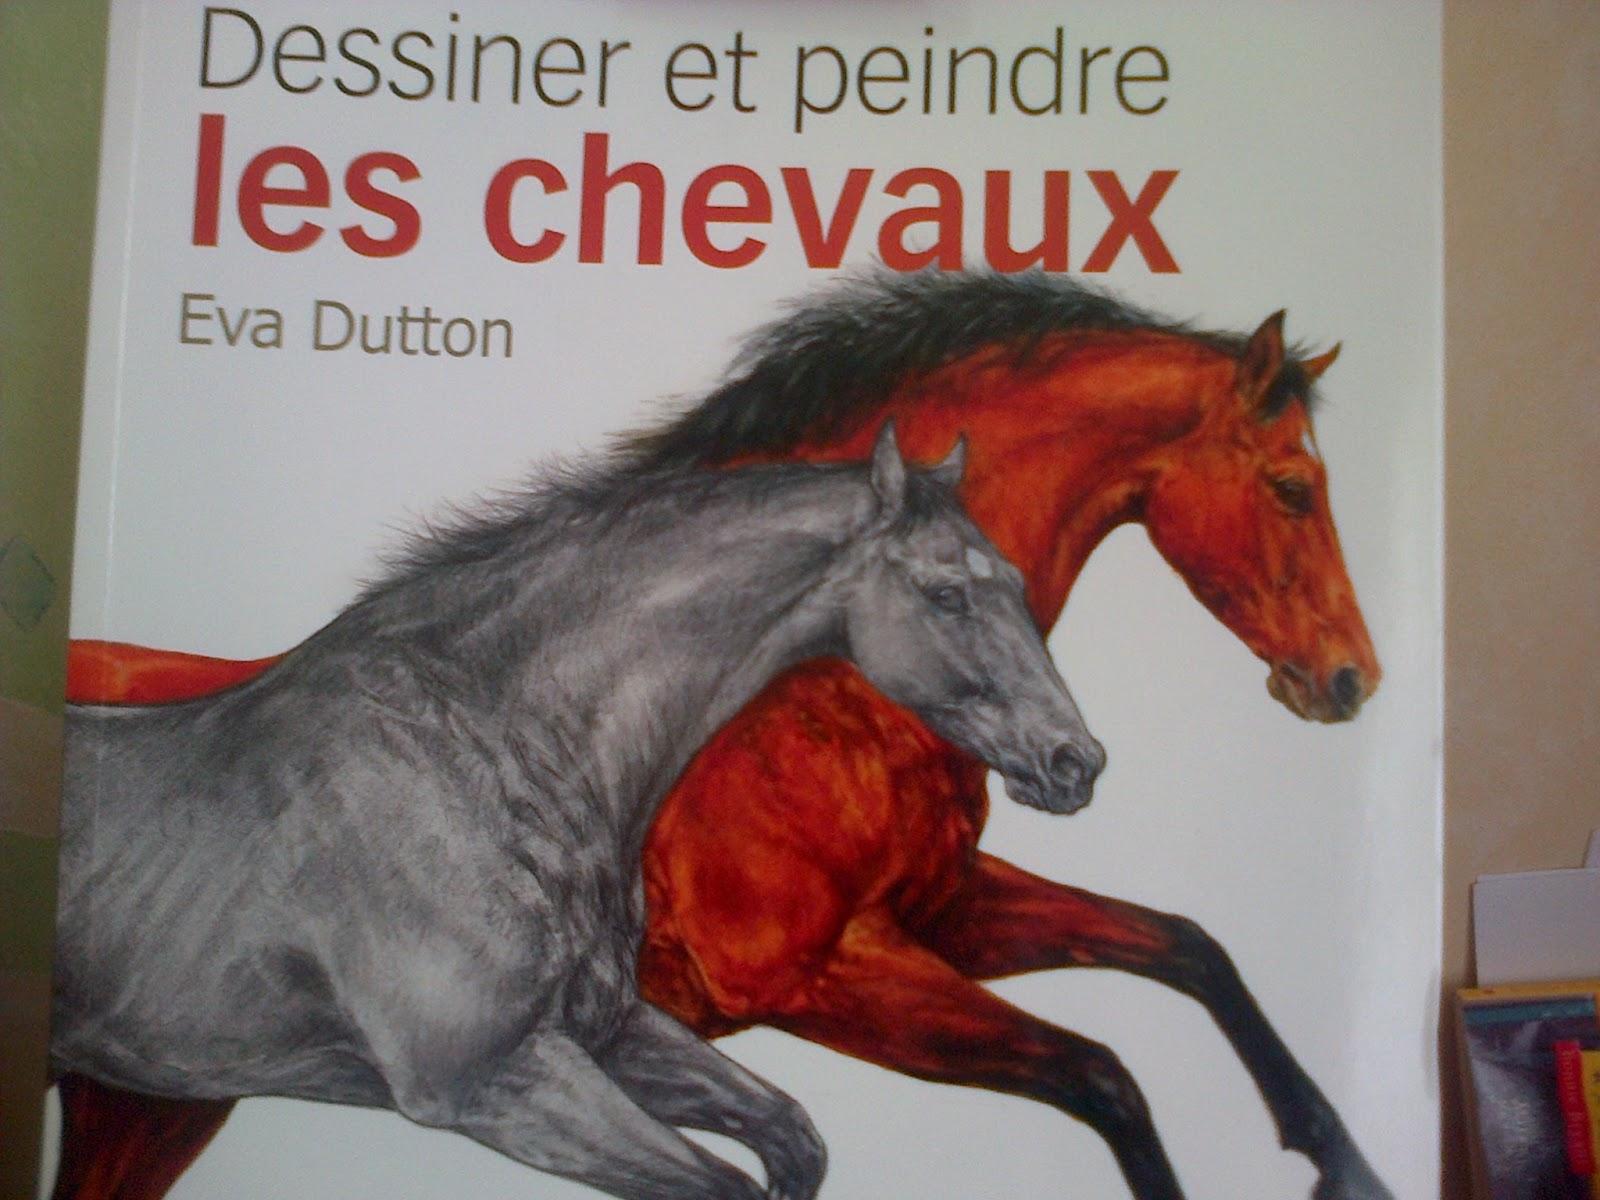 Passion cheval dessiner une t te de cheval - Dessiner cheval ...